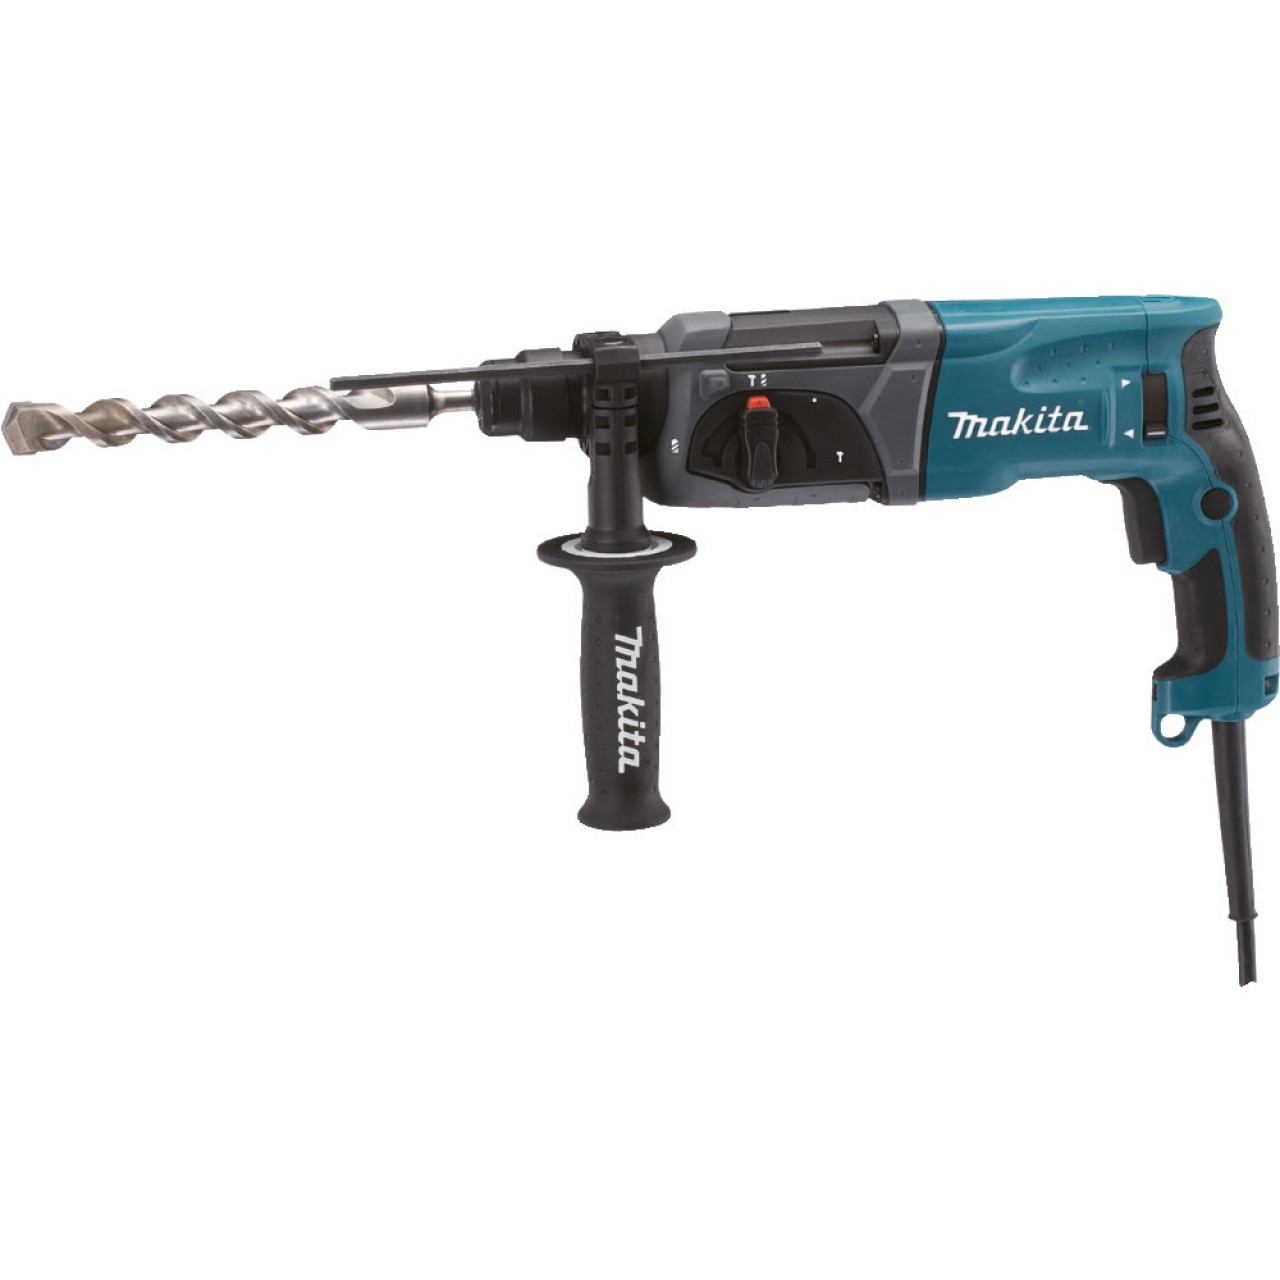 Bohrhammer Makita HR 2470